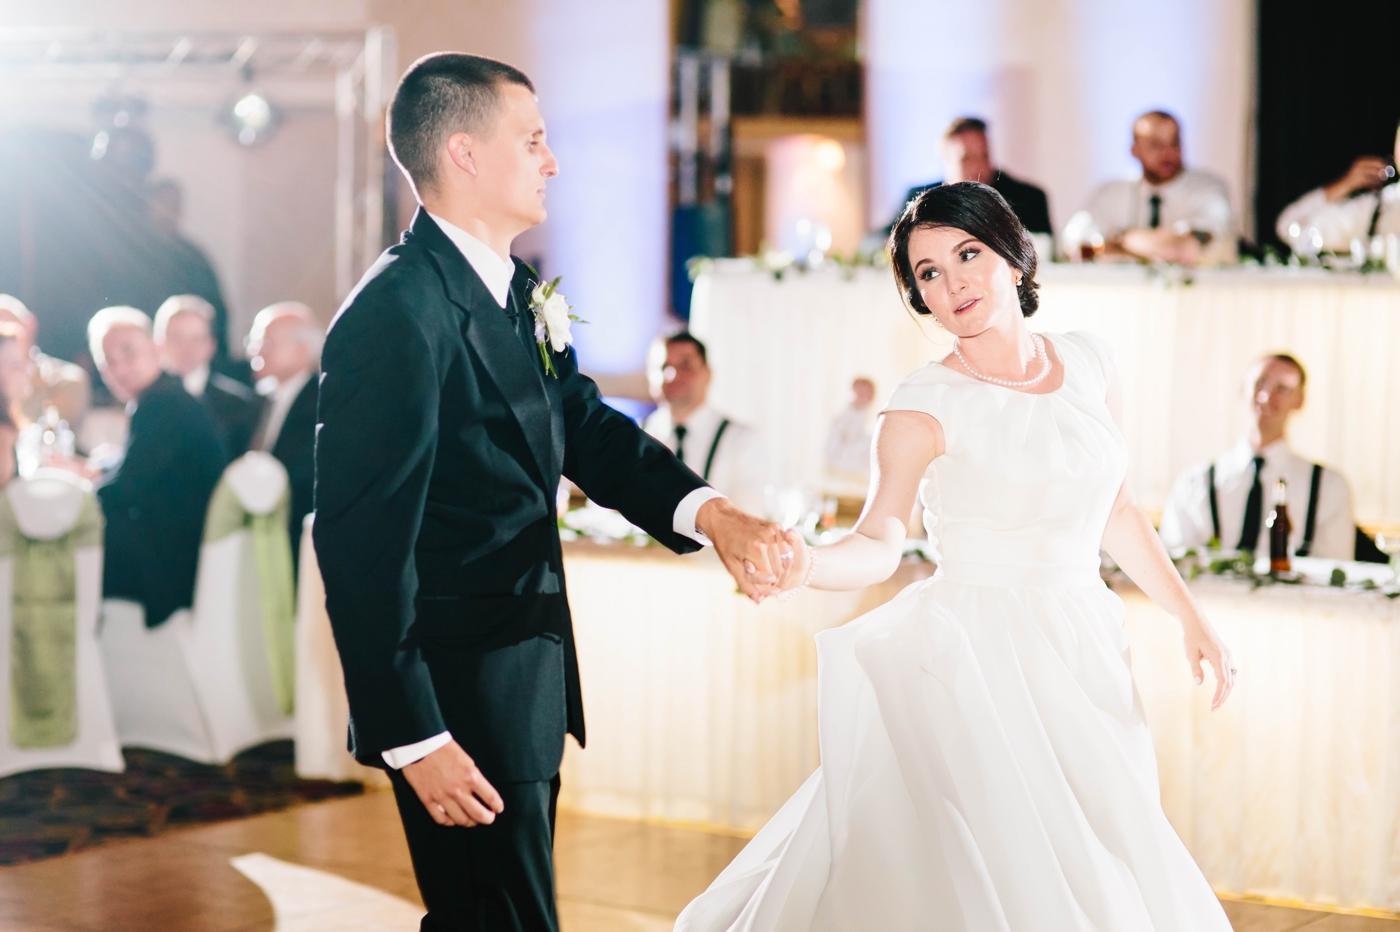 chicago-fine-art-wedding-photography-mccarthy61